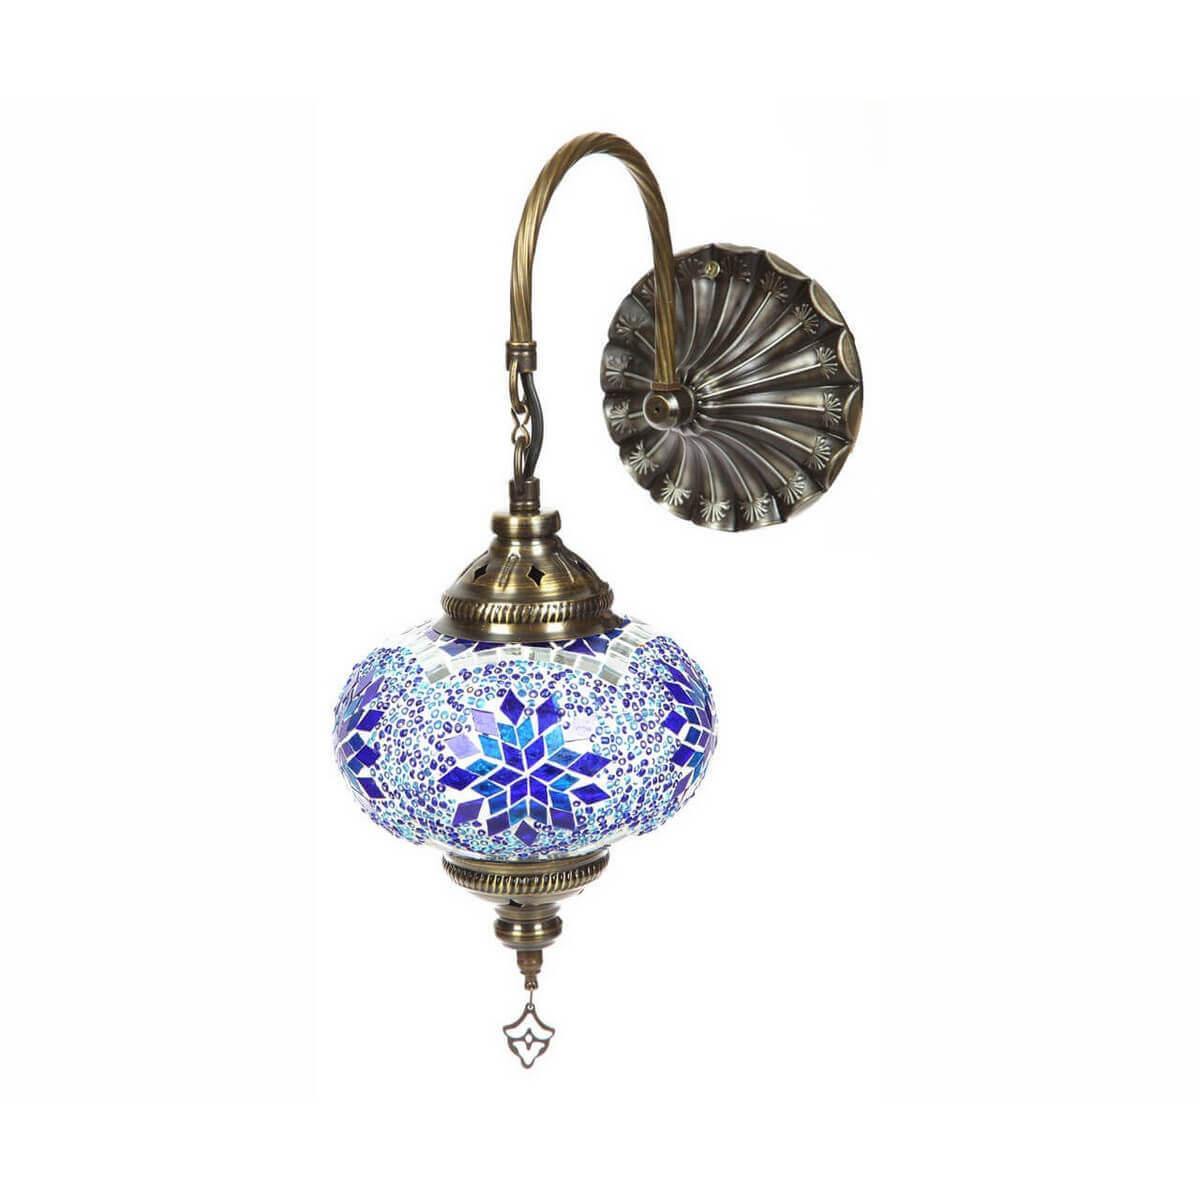 цена Бра Kink Light Марокко 0815T,05 в интернет-магазинах